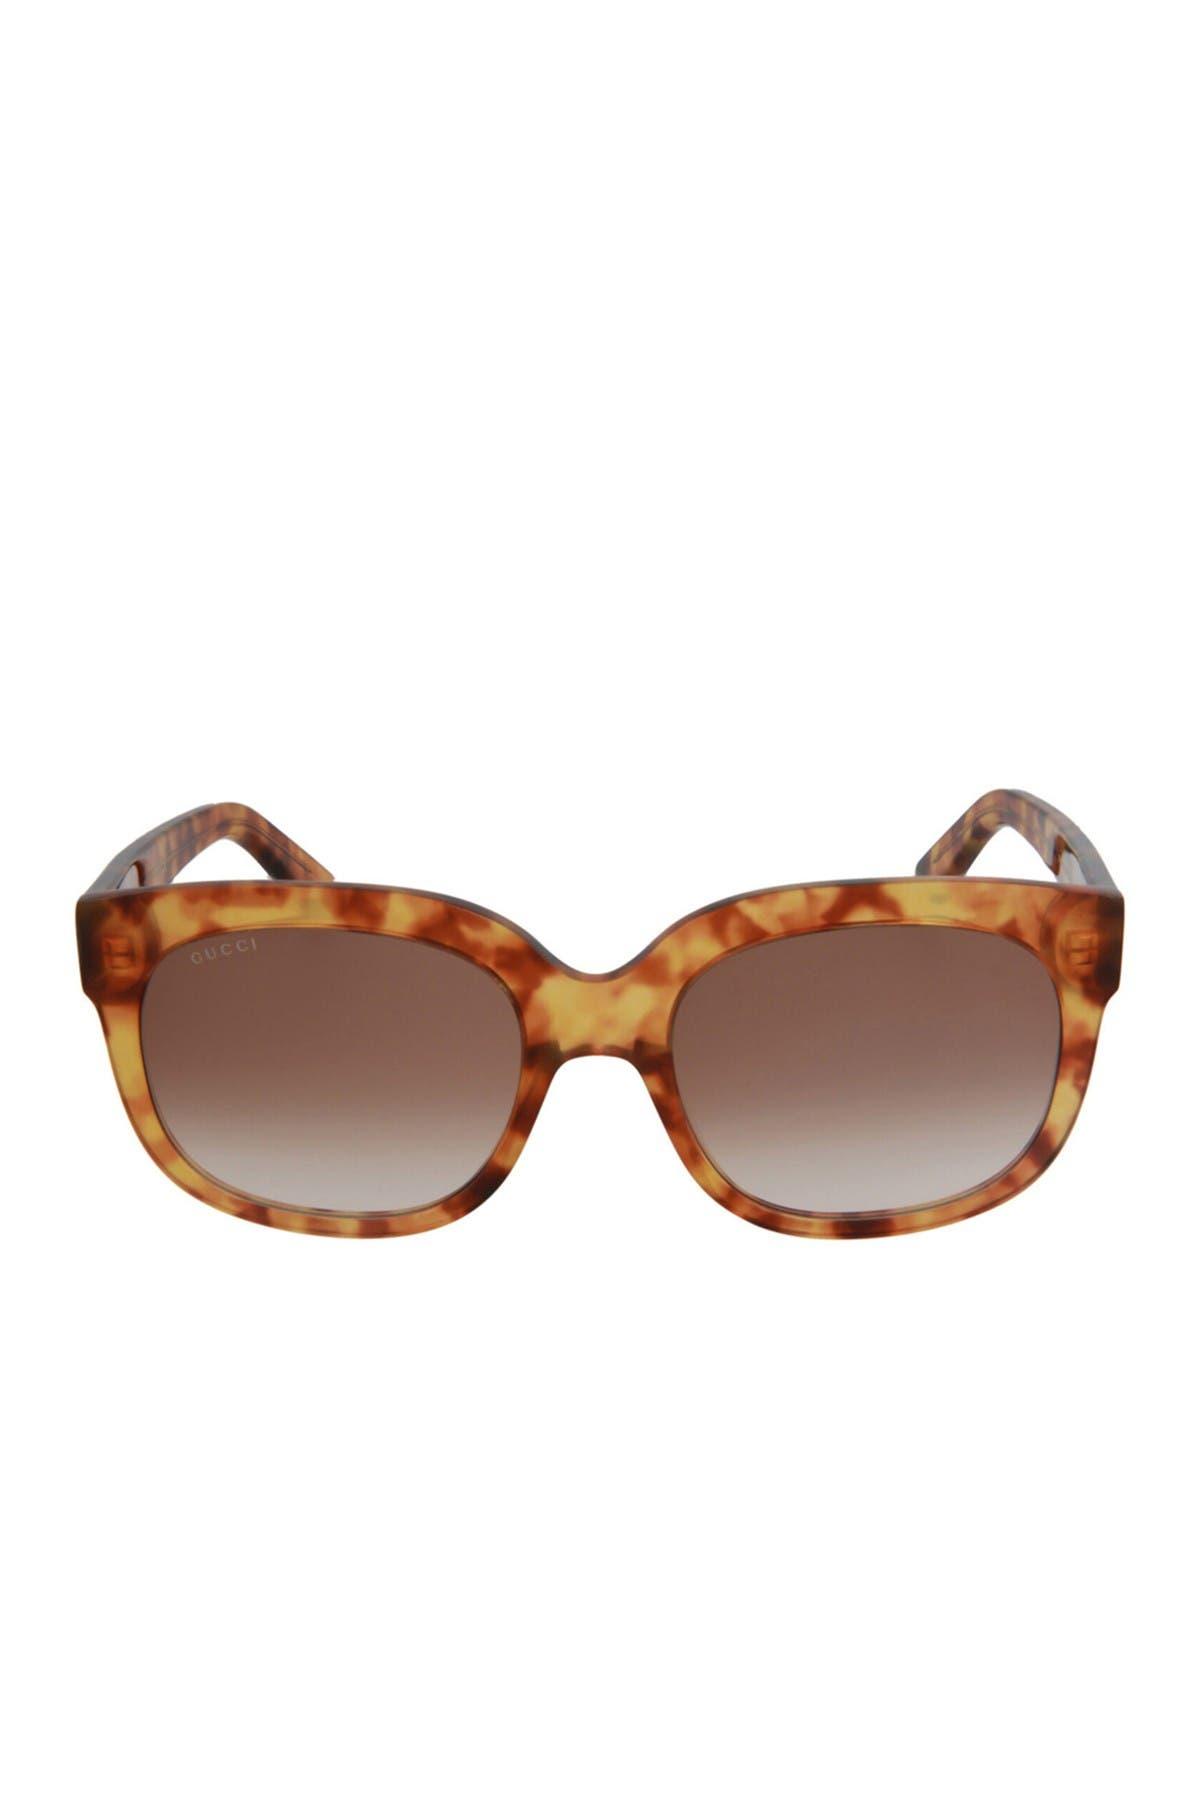 Gucci 56mm Fashion Rectangle Sunglasses In Brown